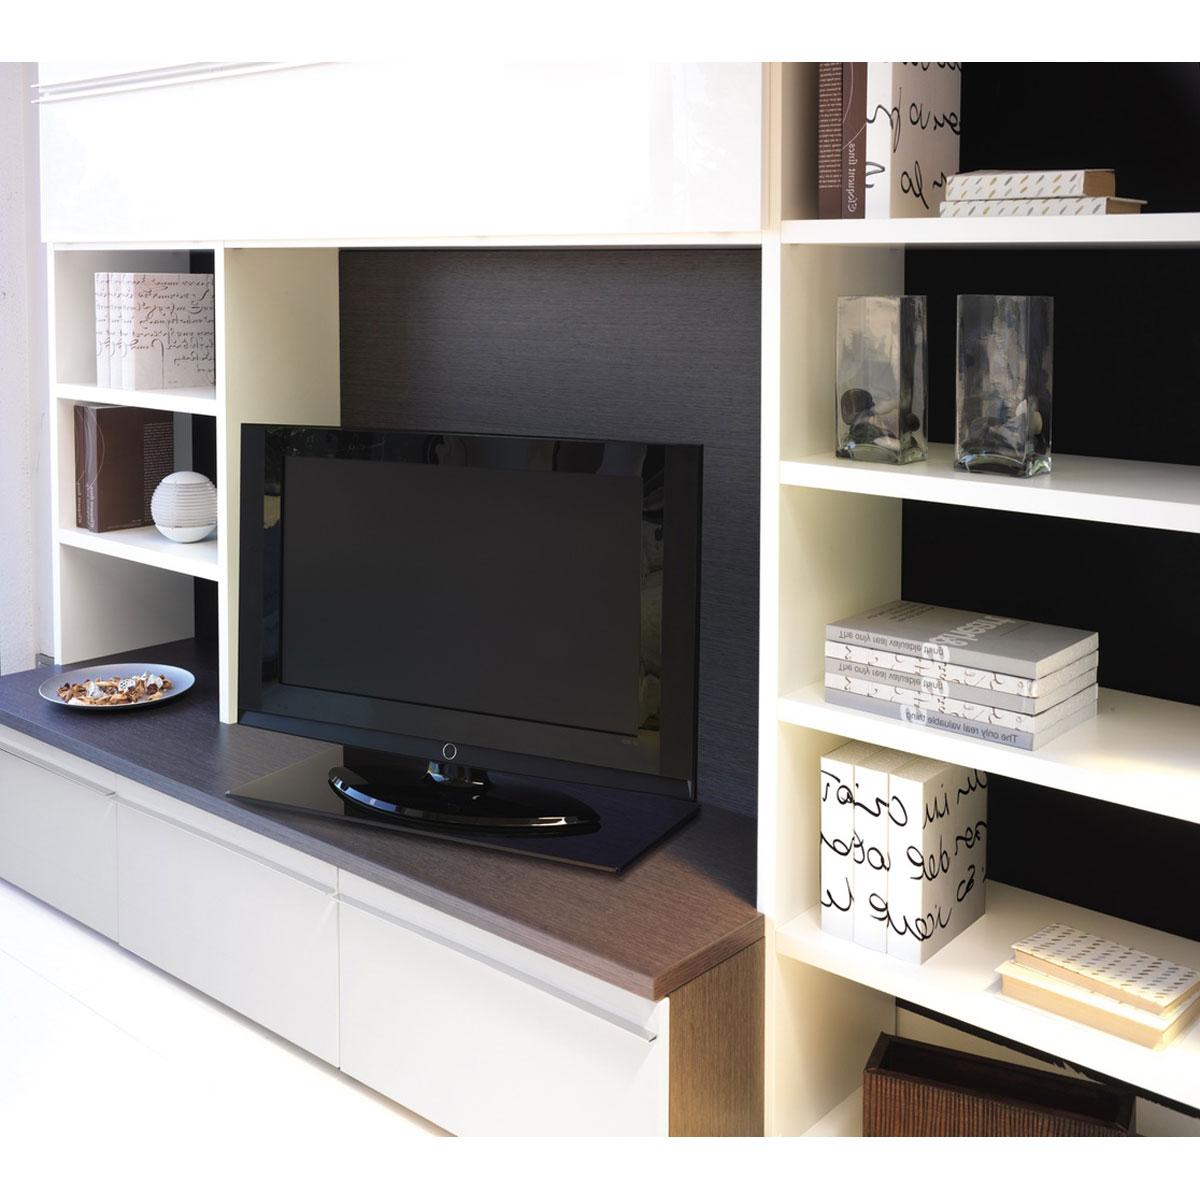 Meliconi Rotobase Elite L Meuble Tv Meliconi Sur Ldlc Com # Meuble Tv Rotatif